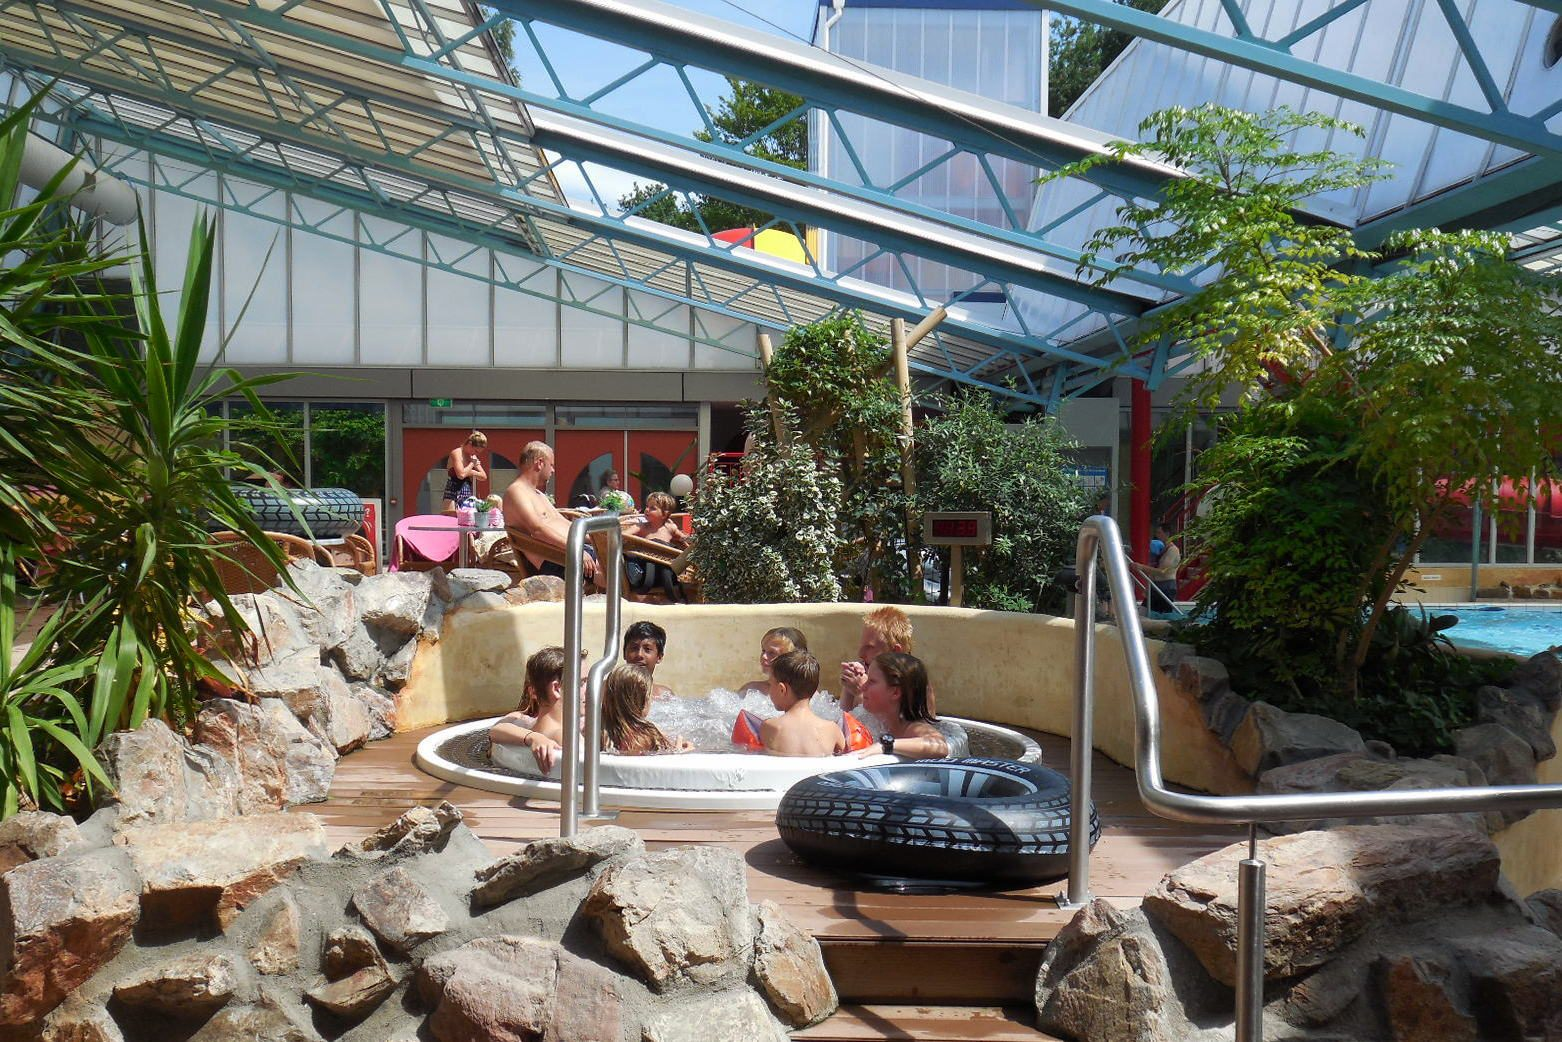 Kinderfeestje E - zwemmen/midgetgolf/ trampoline/eten